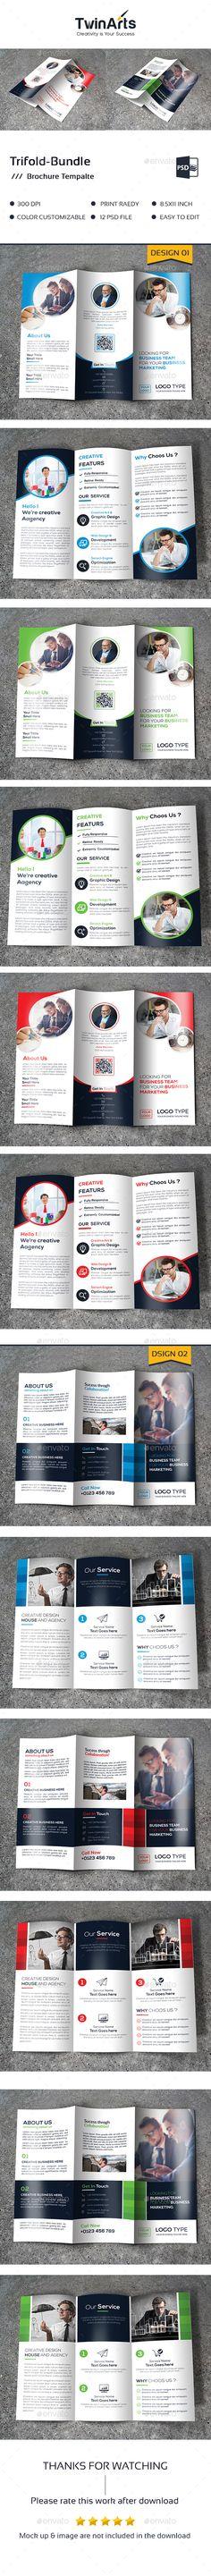 Tri-fold in 1 - Brochures Print Templates Indesign Brochure Templates, Travel Brochure Template, Bi Fold Brochure, Business Brochure, Brochure Design, Booklet Design, Pose, Corporate, Print Templates